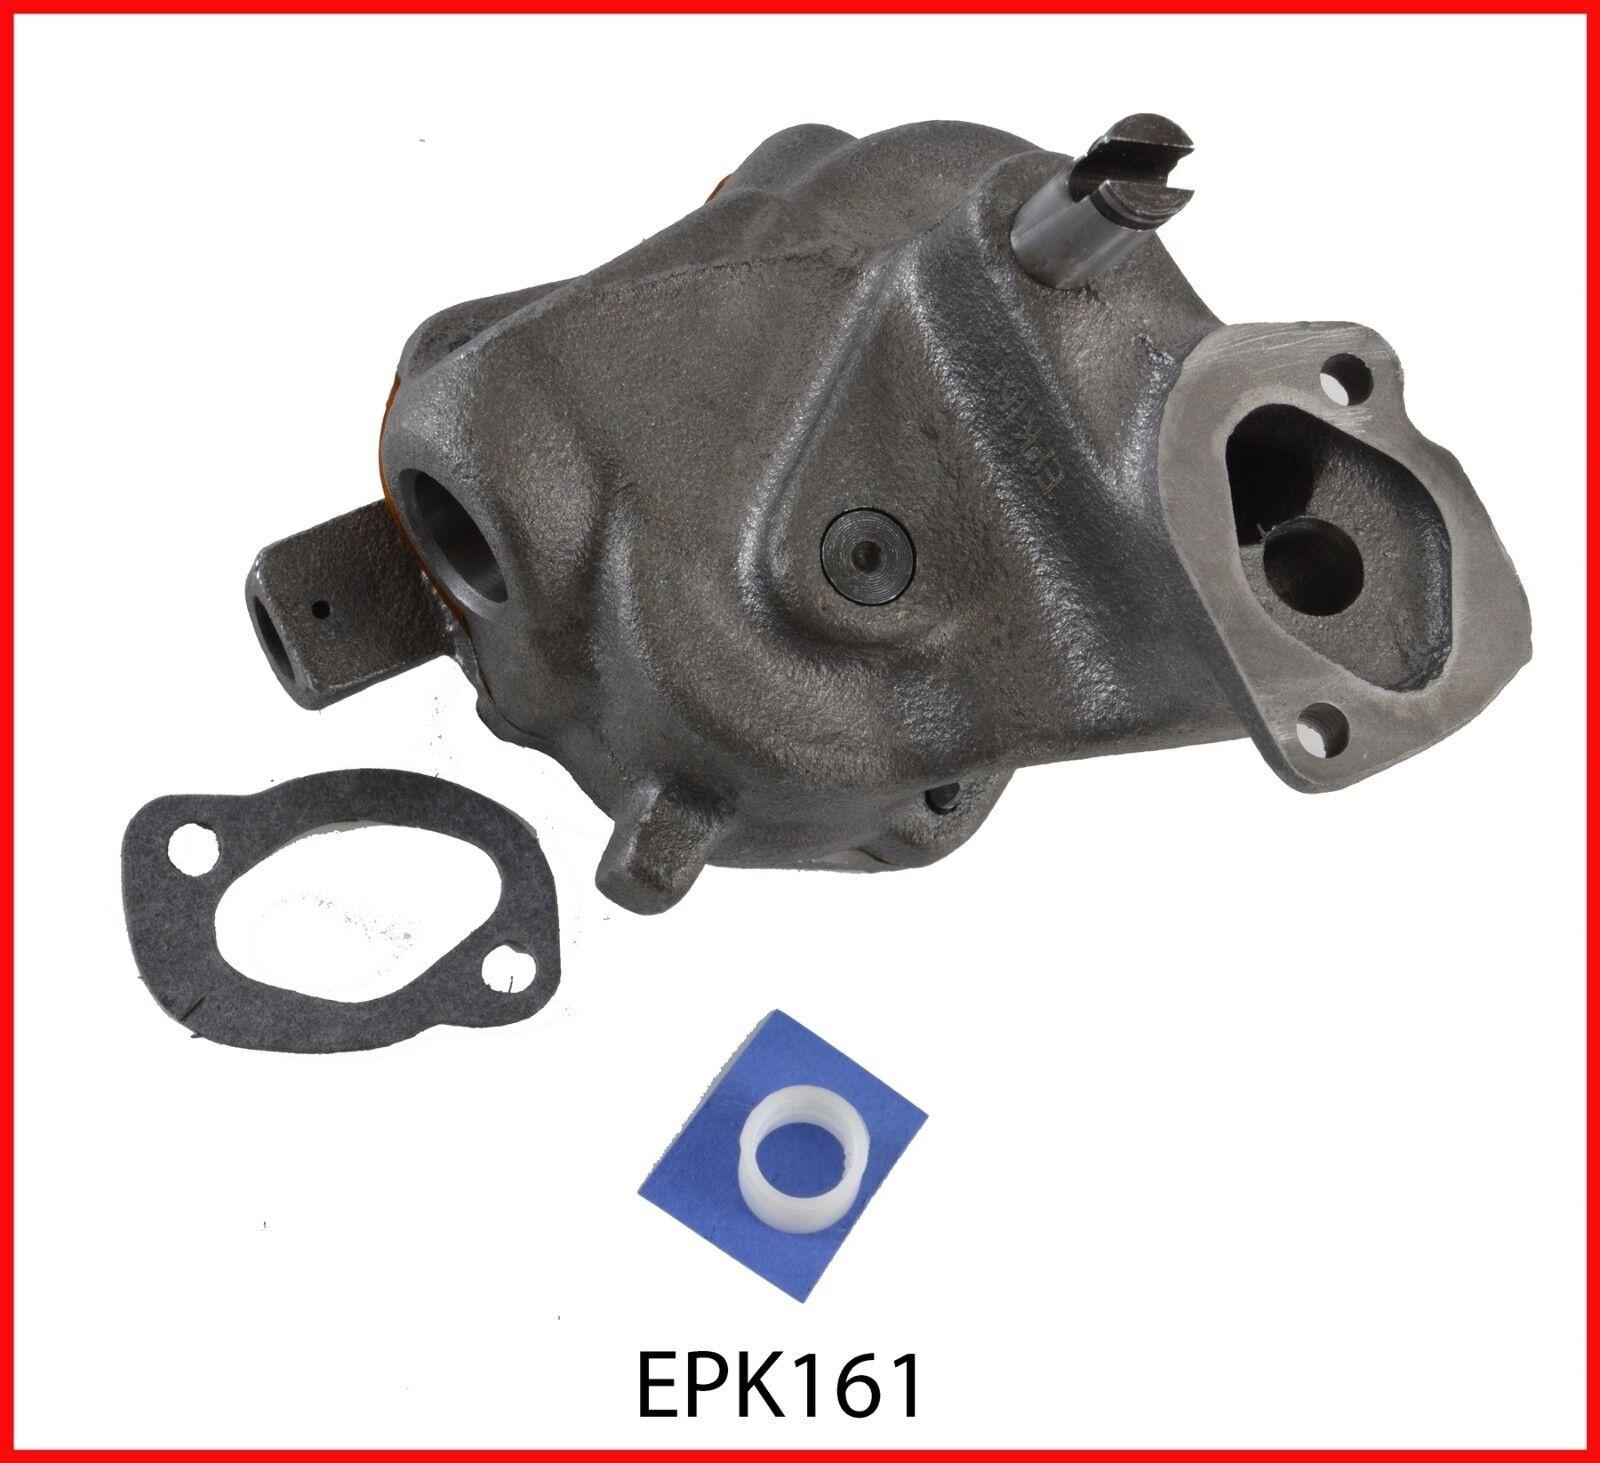 Engine Rebuild Overhaul Kit FITS 1996-1999 Chevrolet GMC 454 7.4L V8 Vortec Vin J